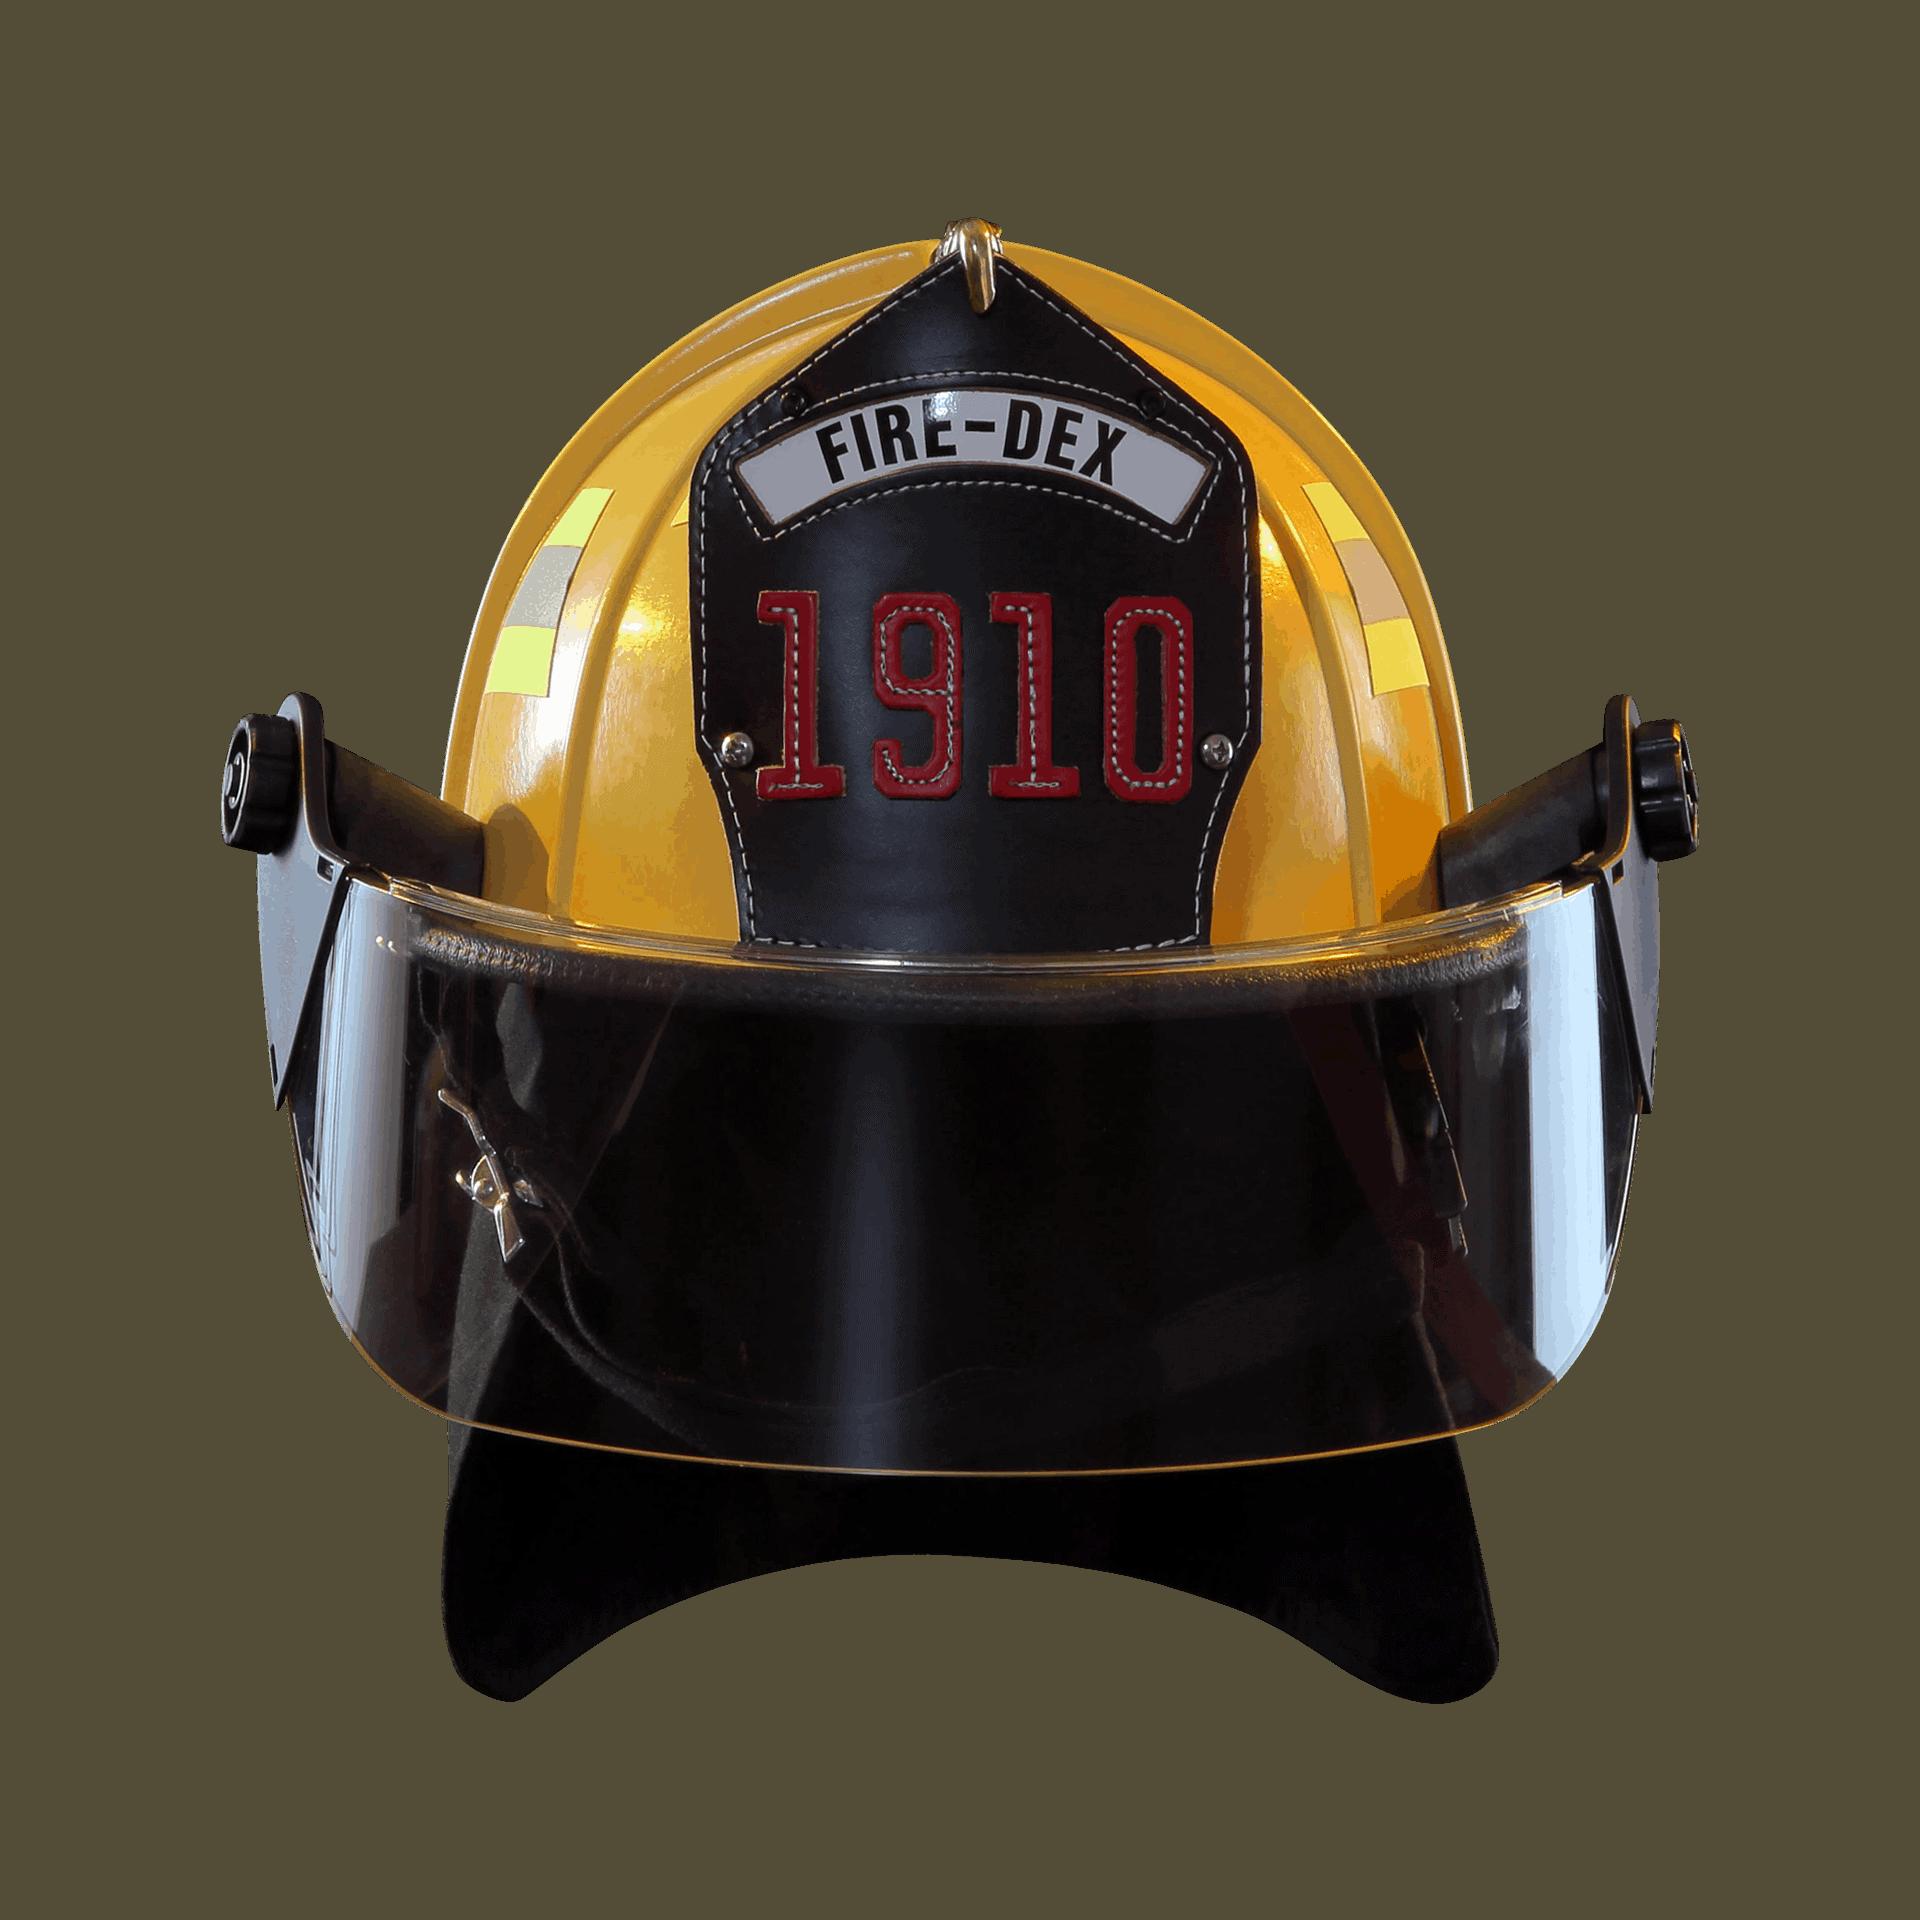 Fire-Dex Traditional Helmet - Yellow